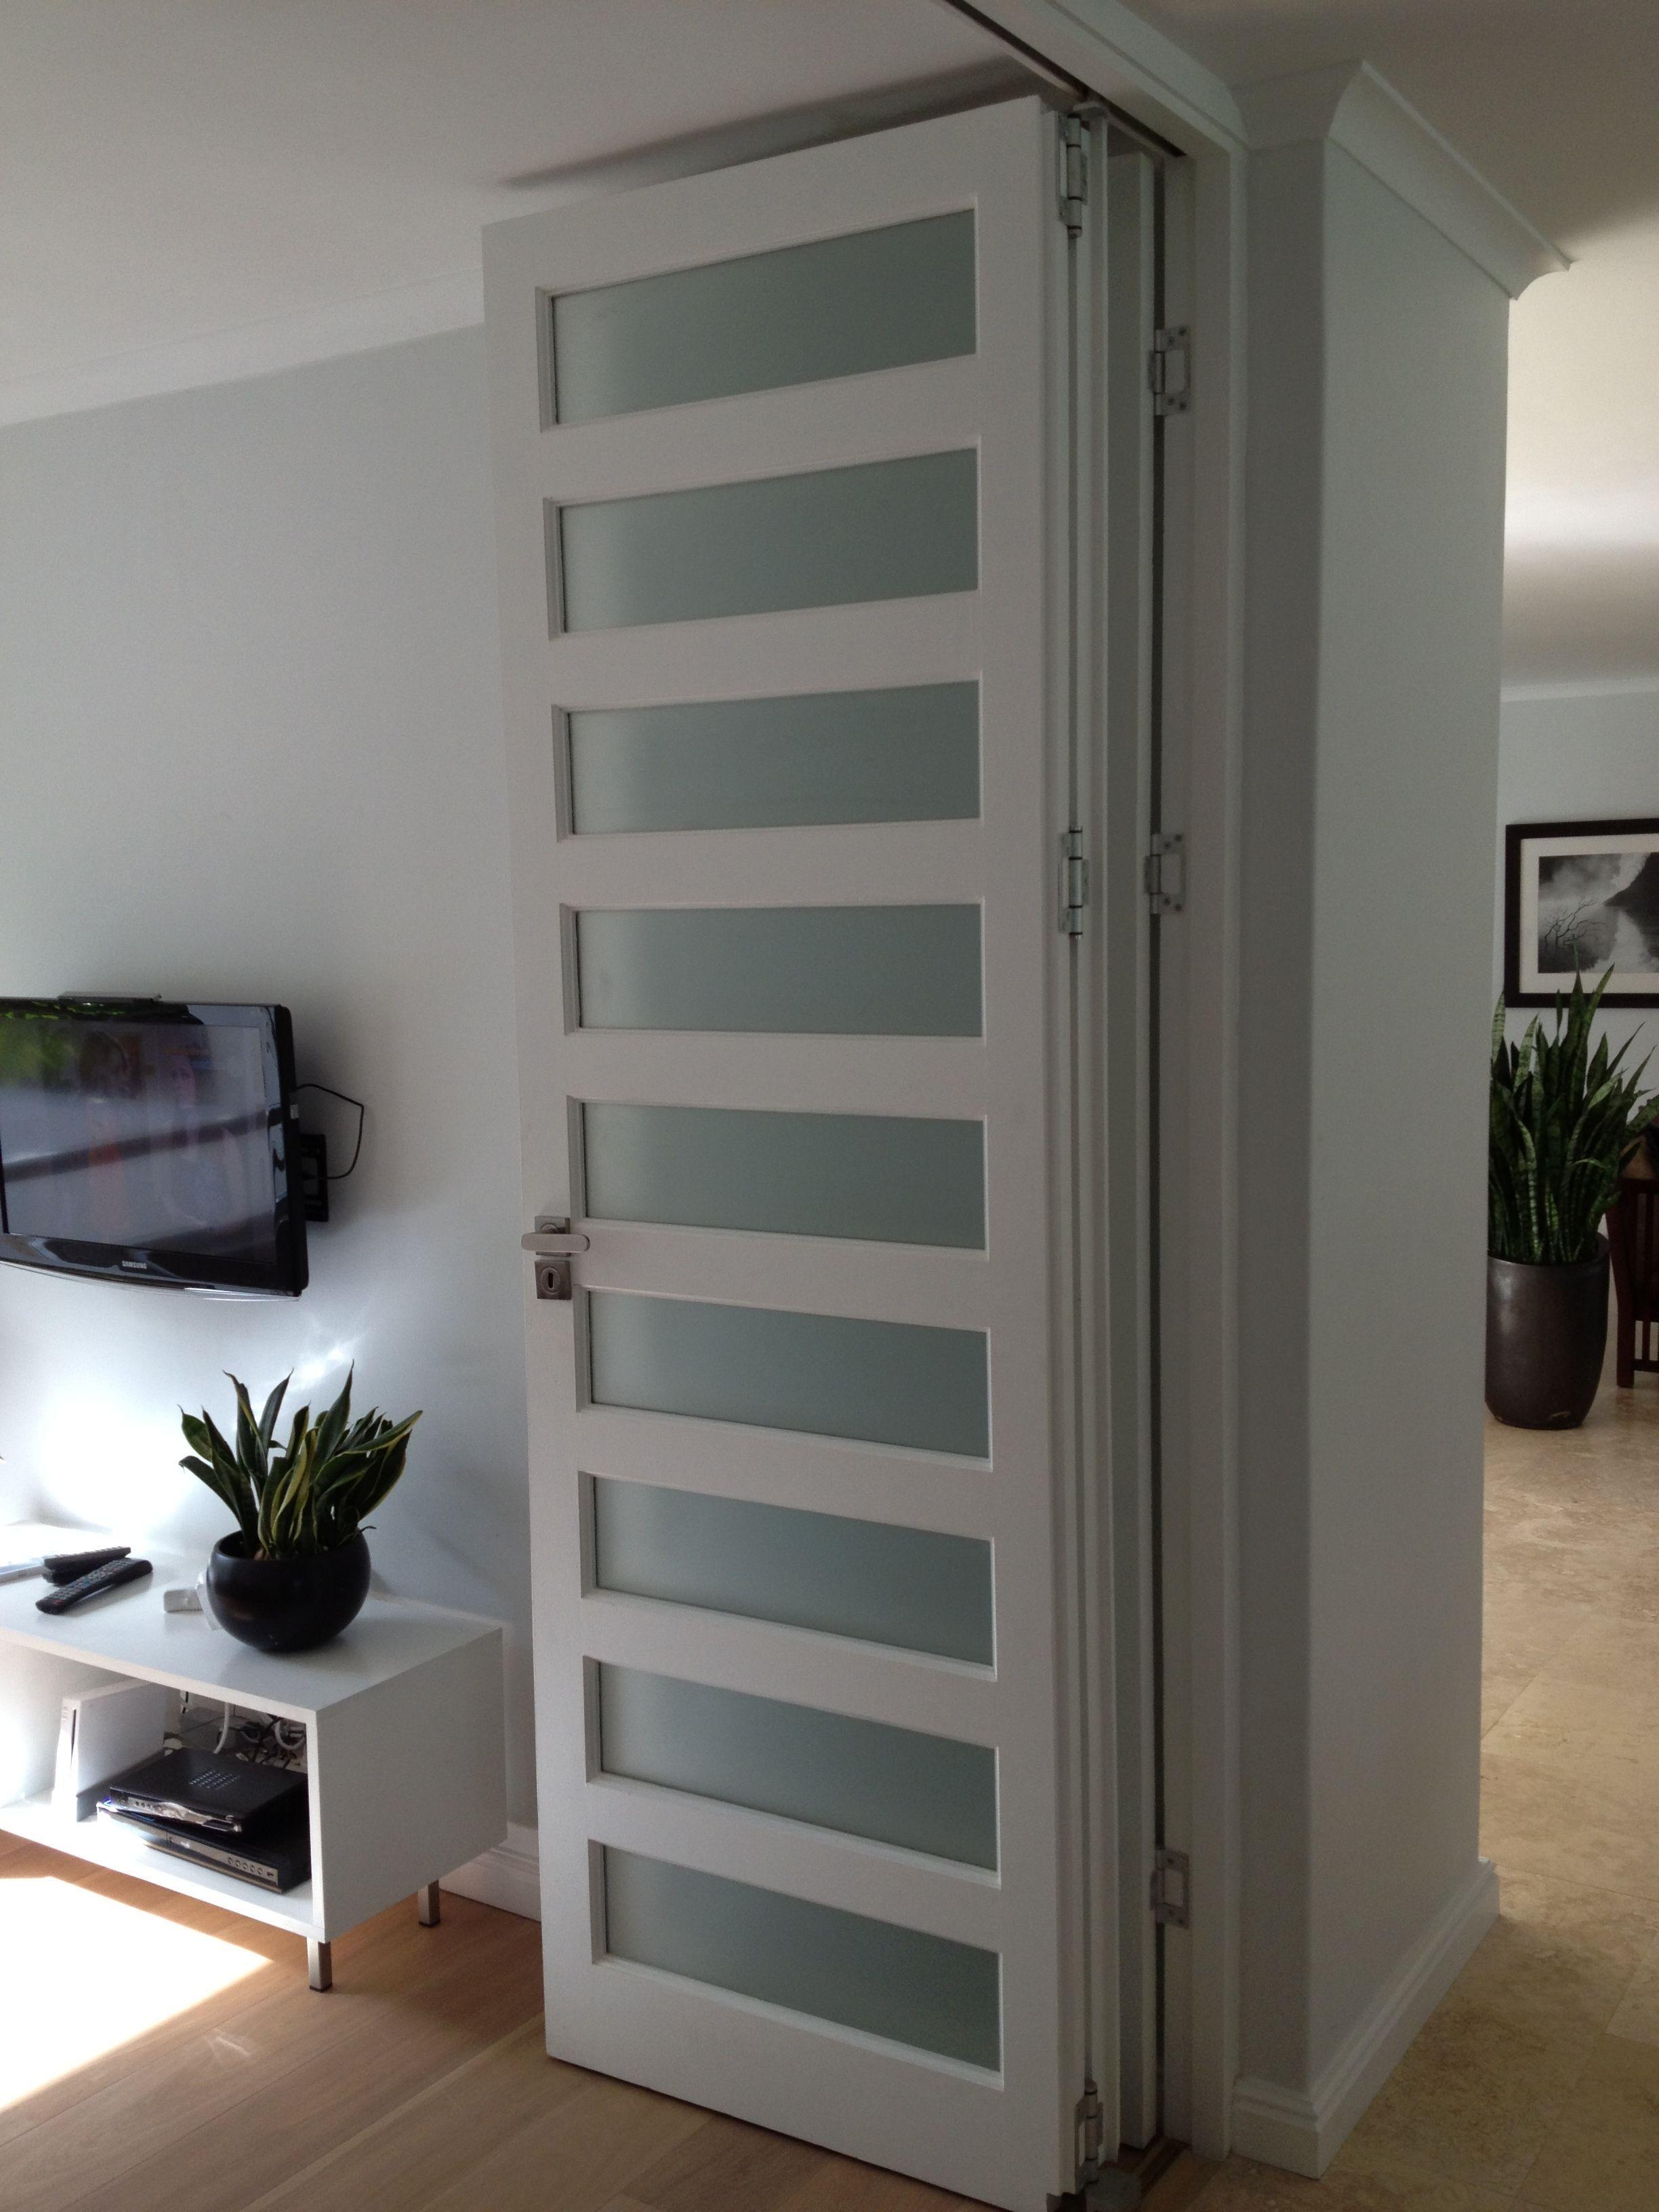 Accordion Folding Doors And Room Dividers For Home Slidingroomdividershojiscreen